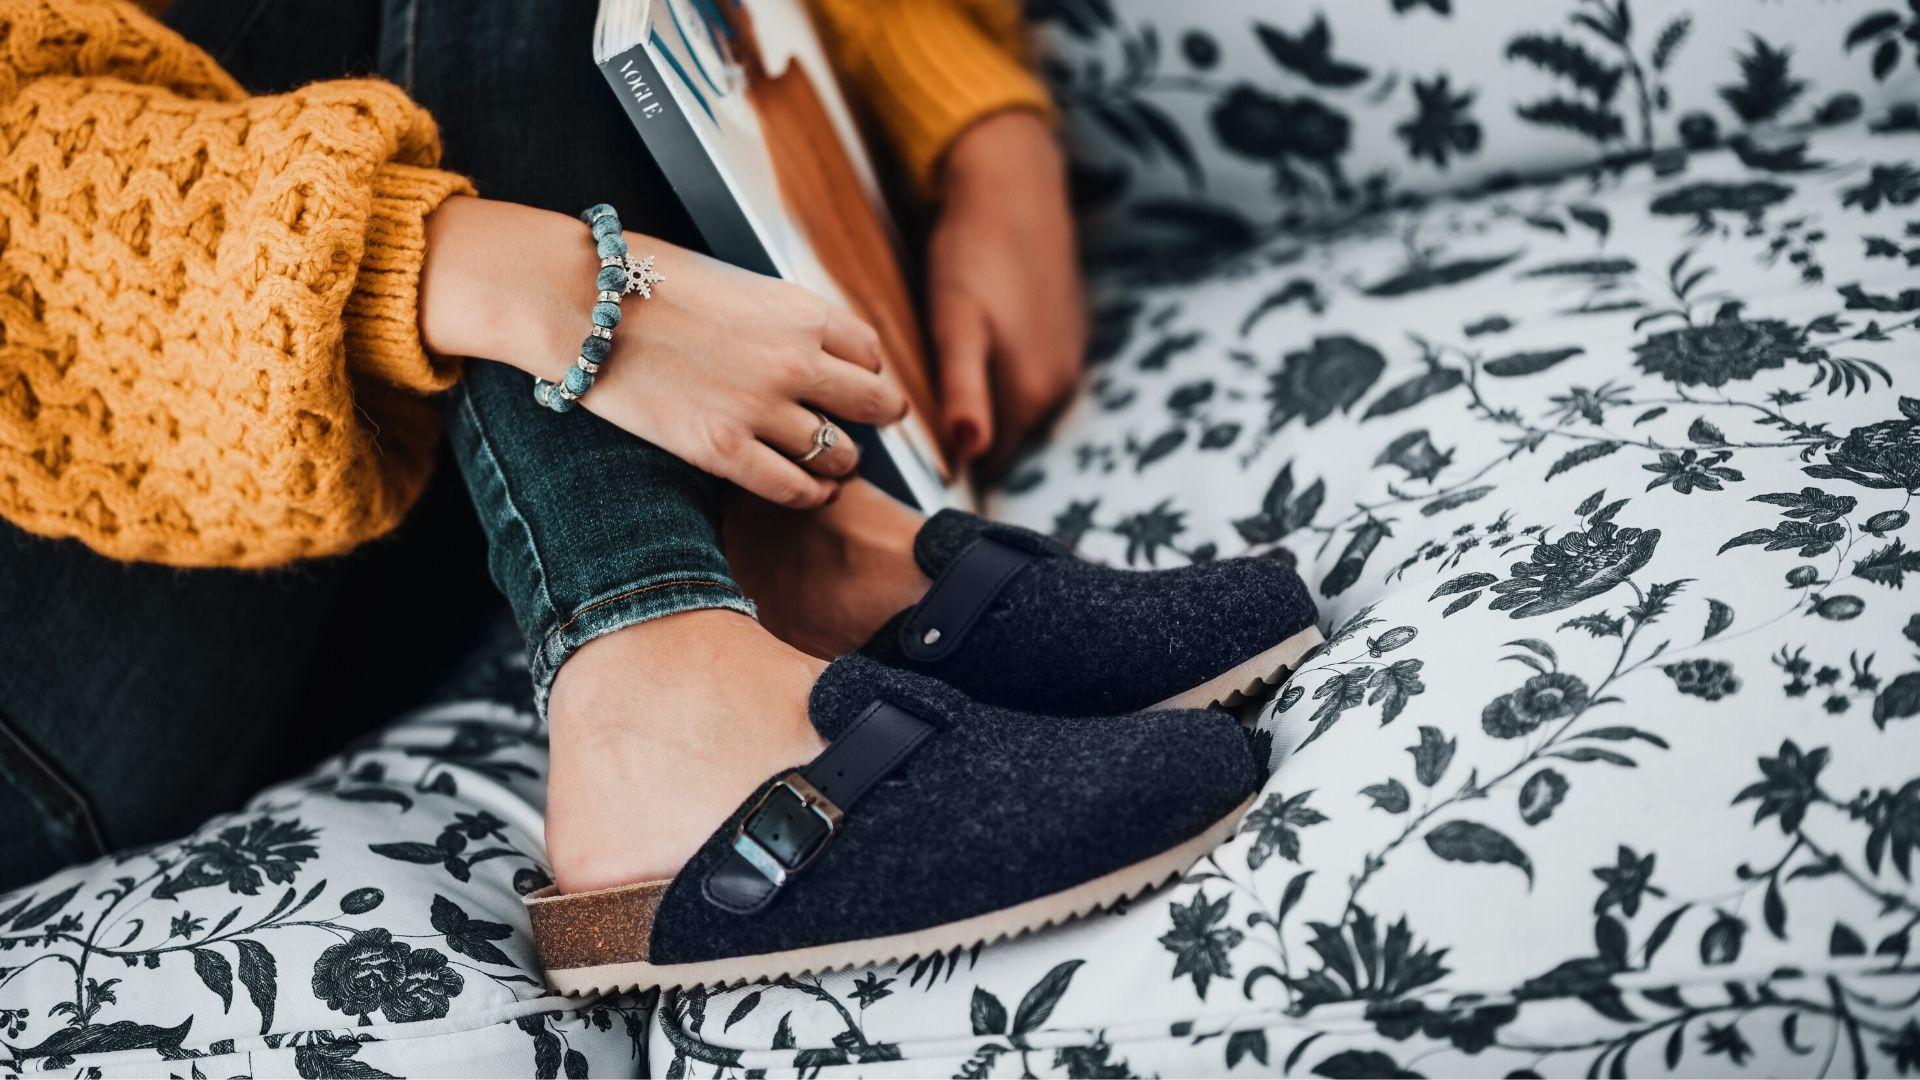 pantofle s plnou špičkou